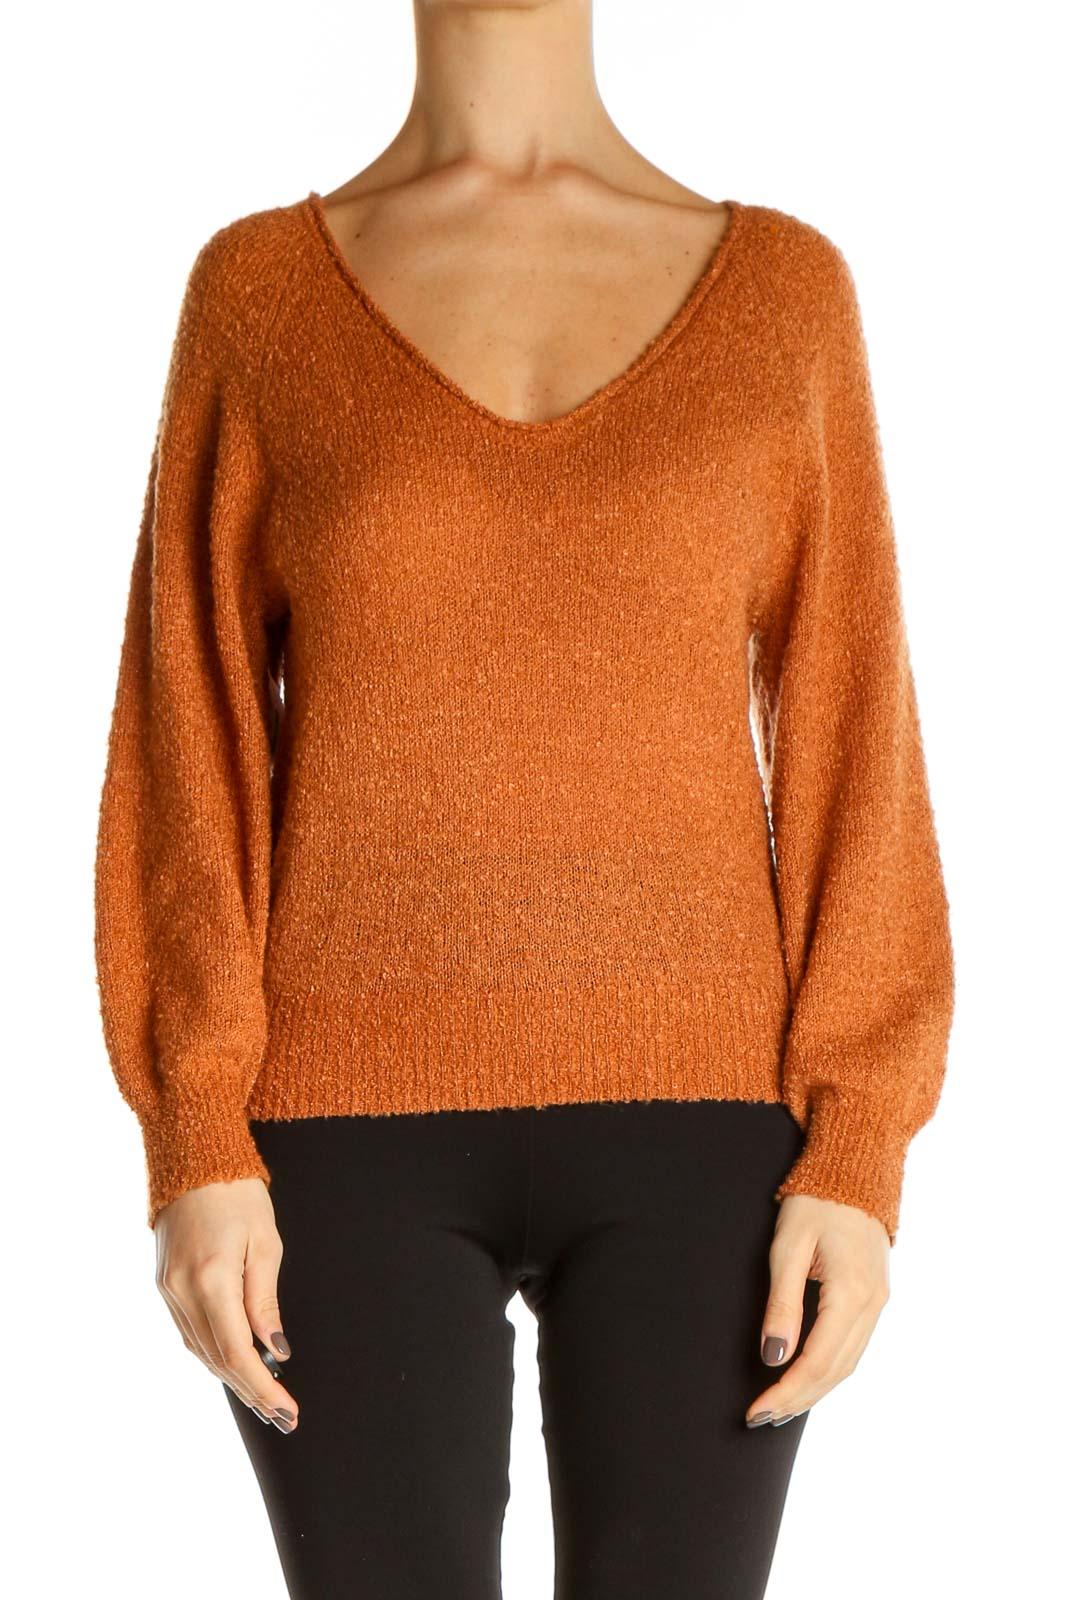 Orange Textured All Day Wear Sweater Front